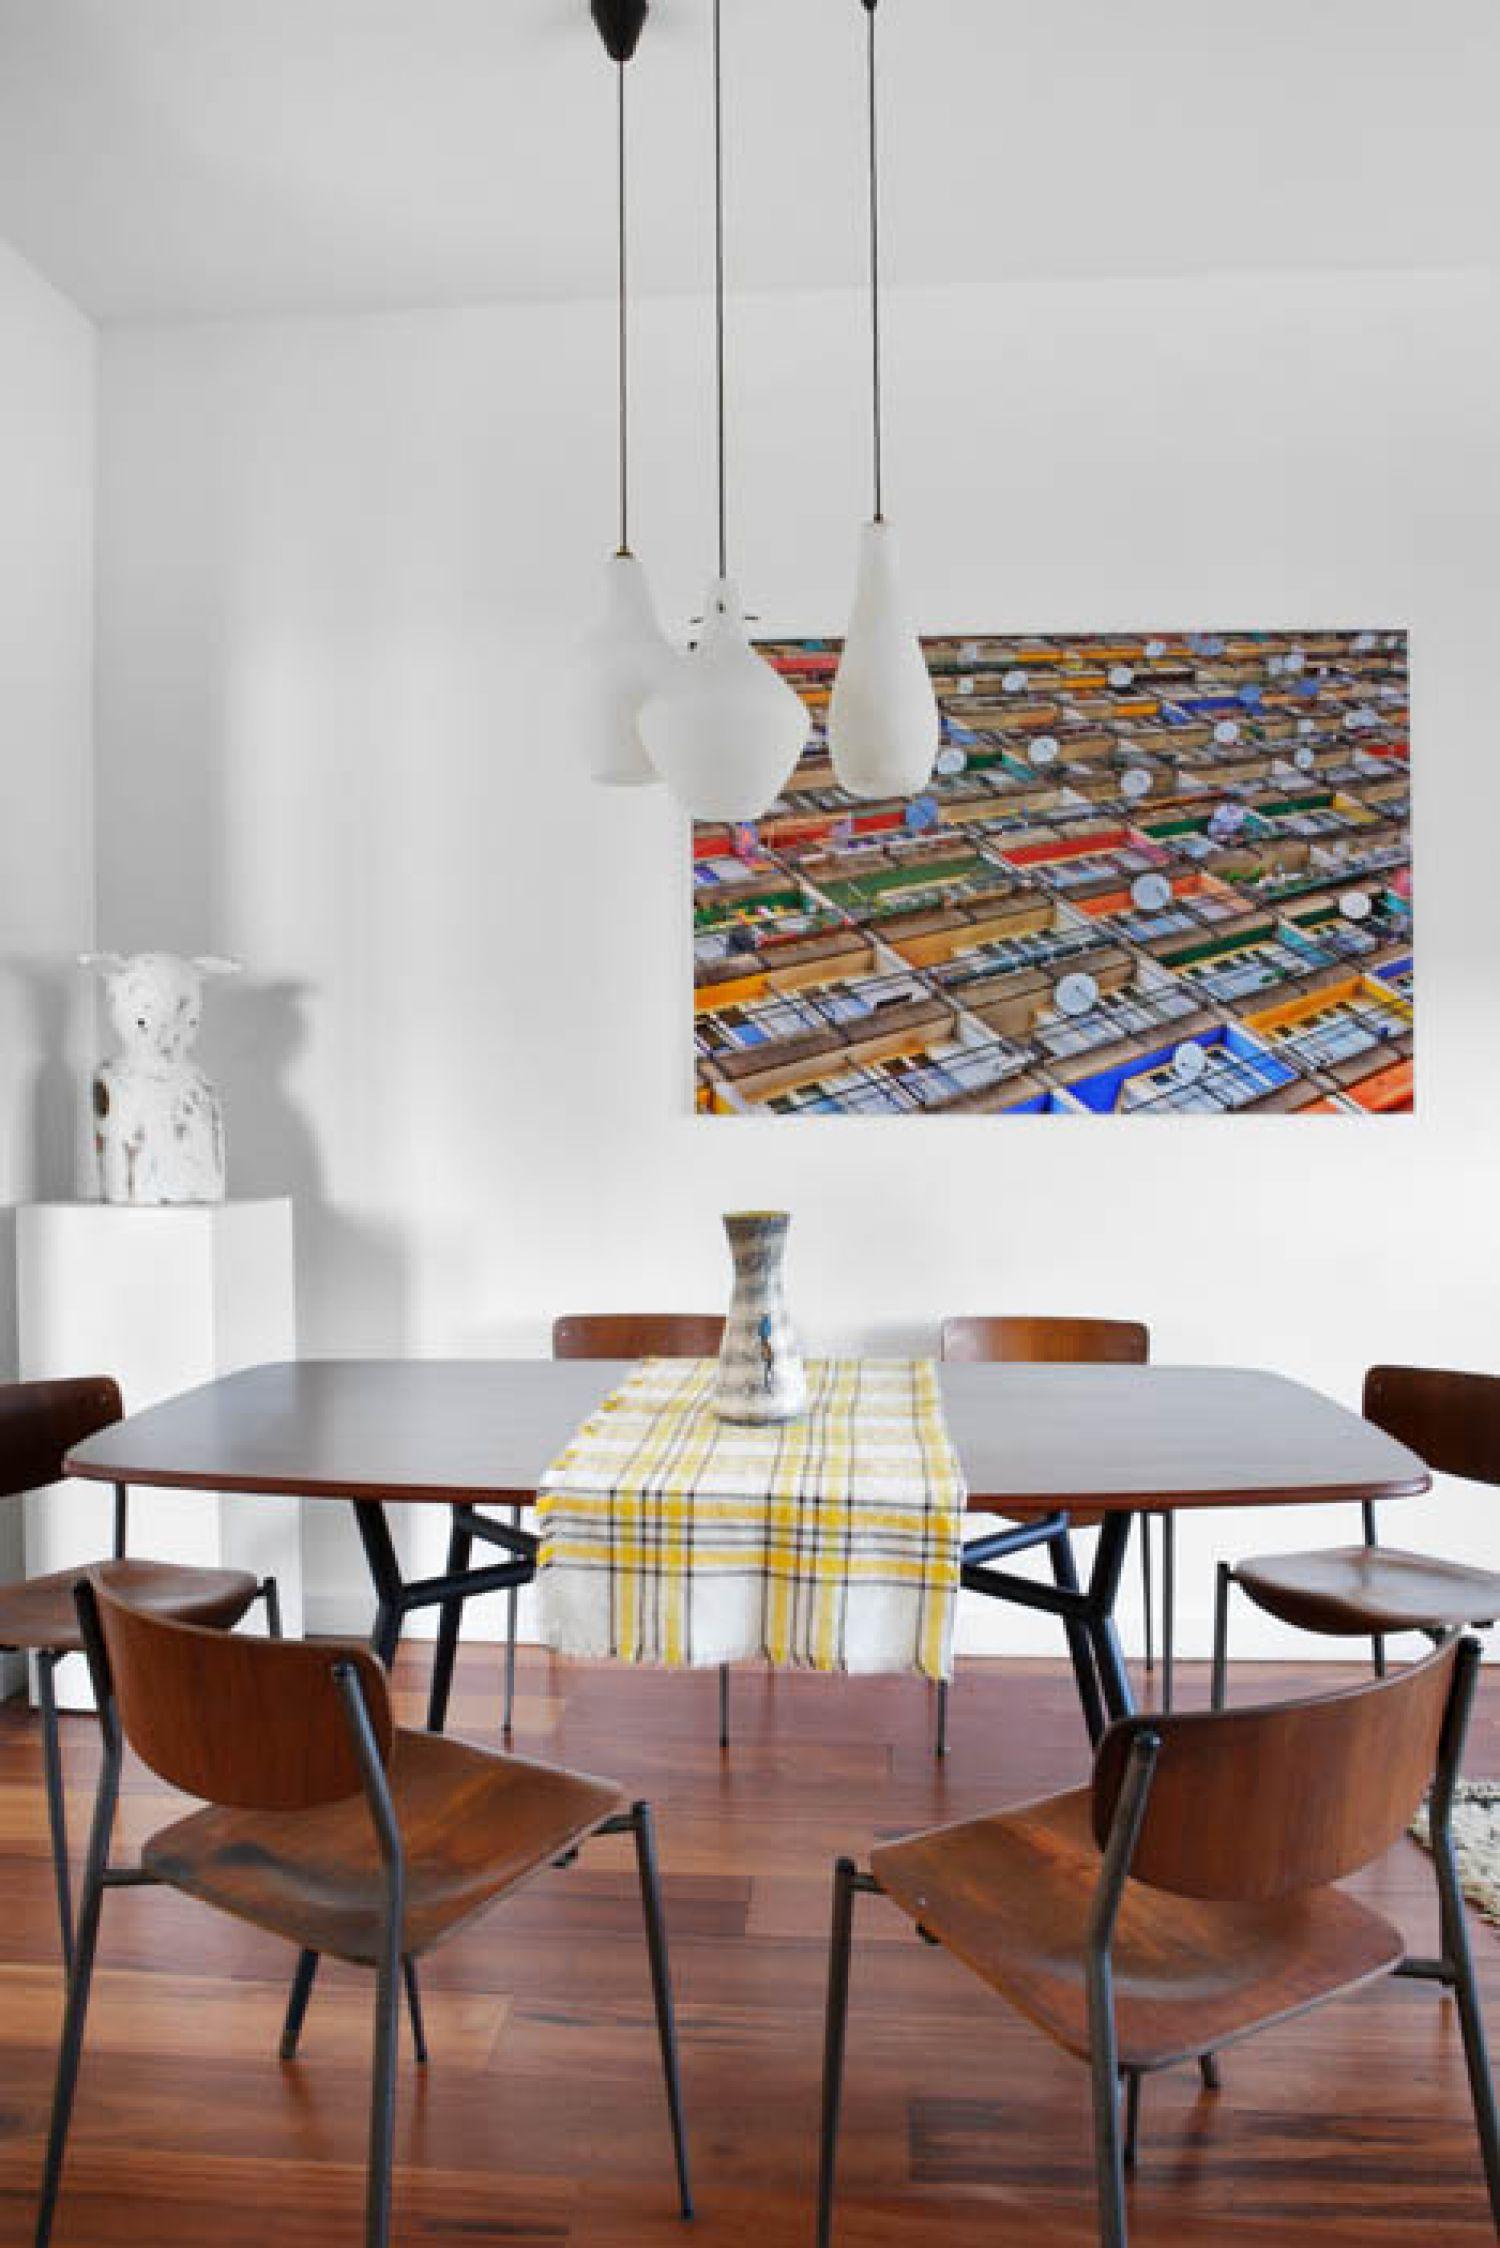 Mikel irastorza interior design berlin for Design berlin